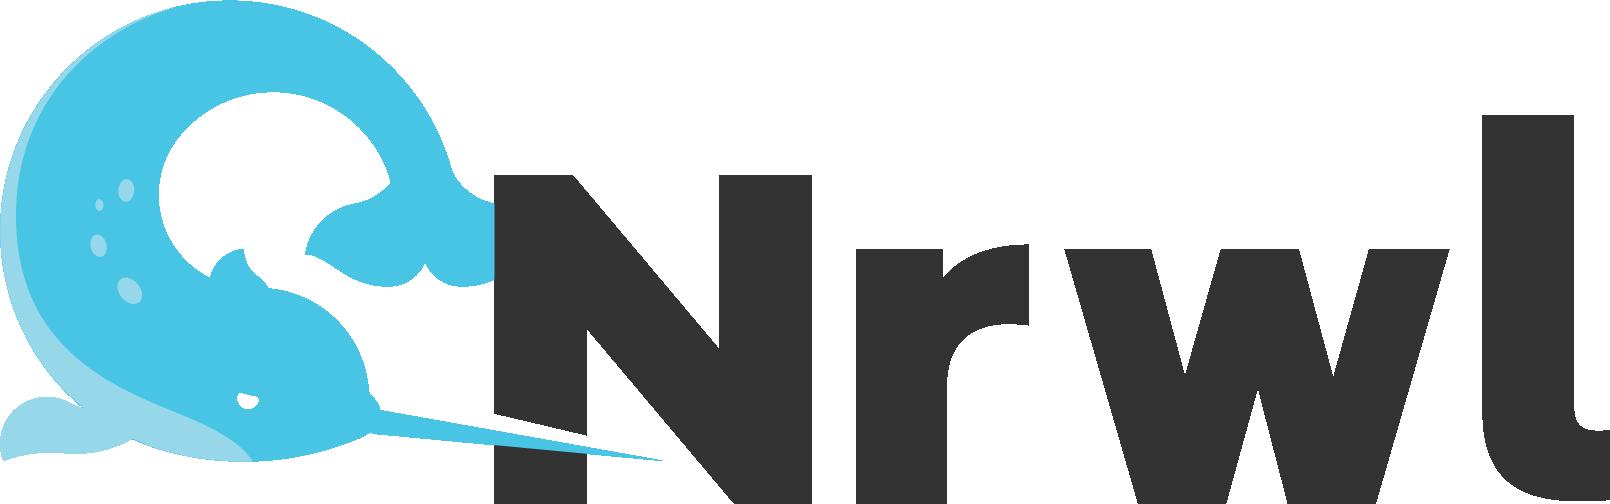 Narwhal Technologies Inc. logo